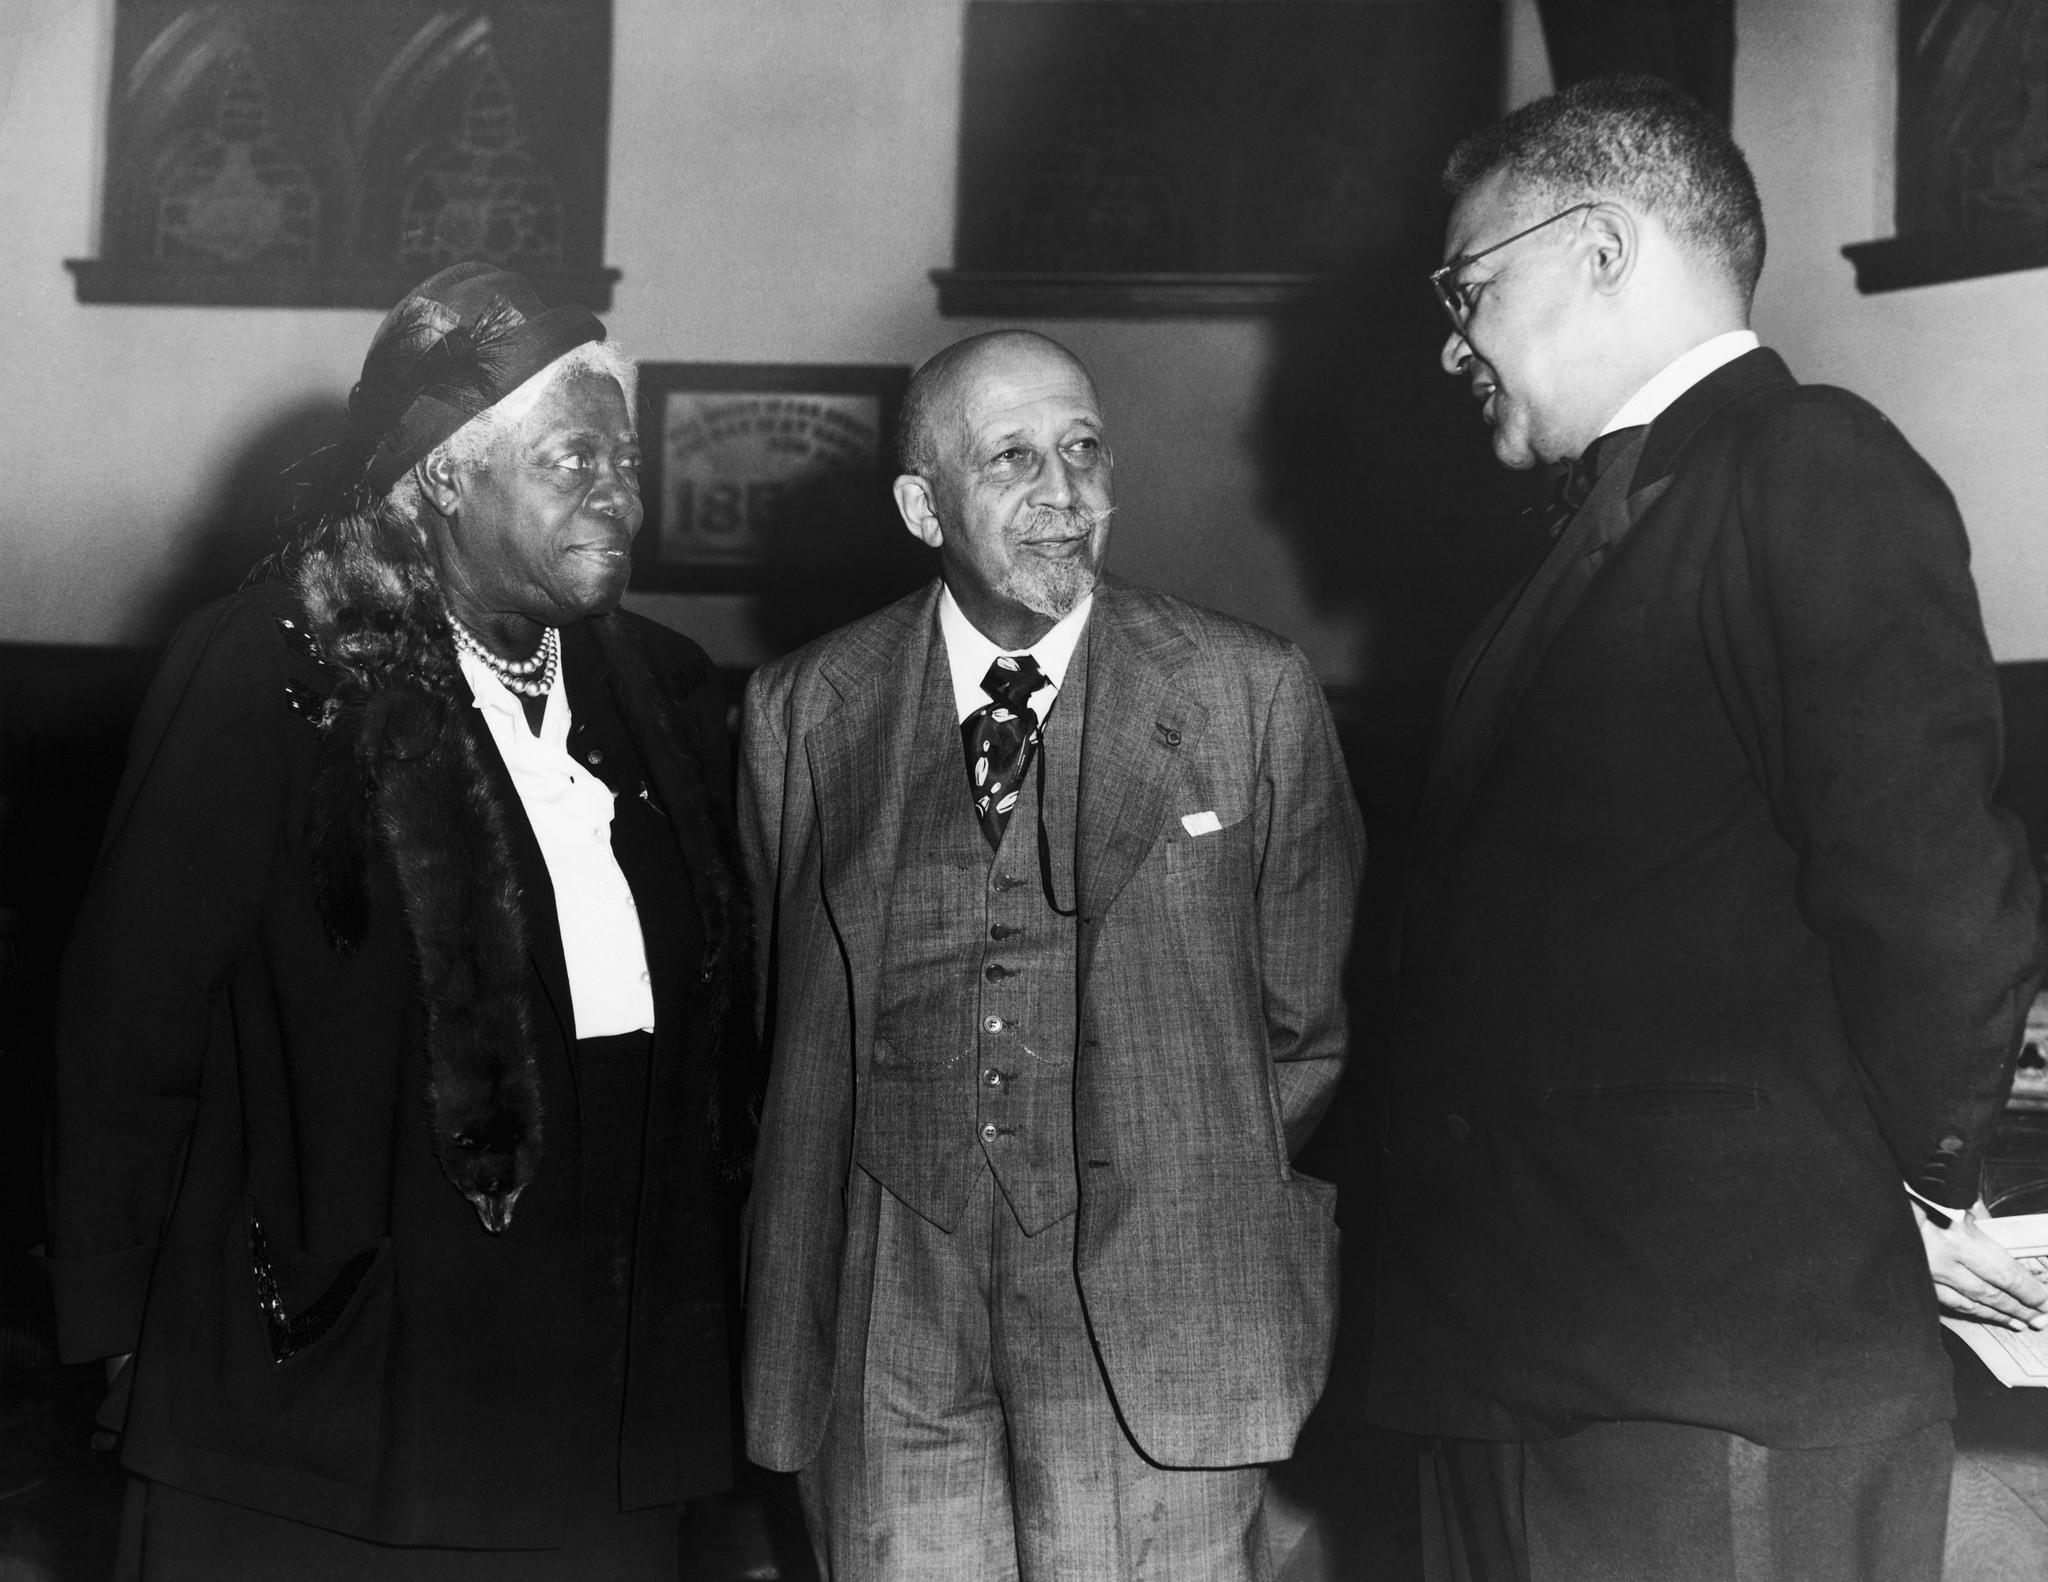 web du bois believed that african american should